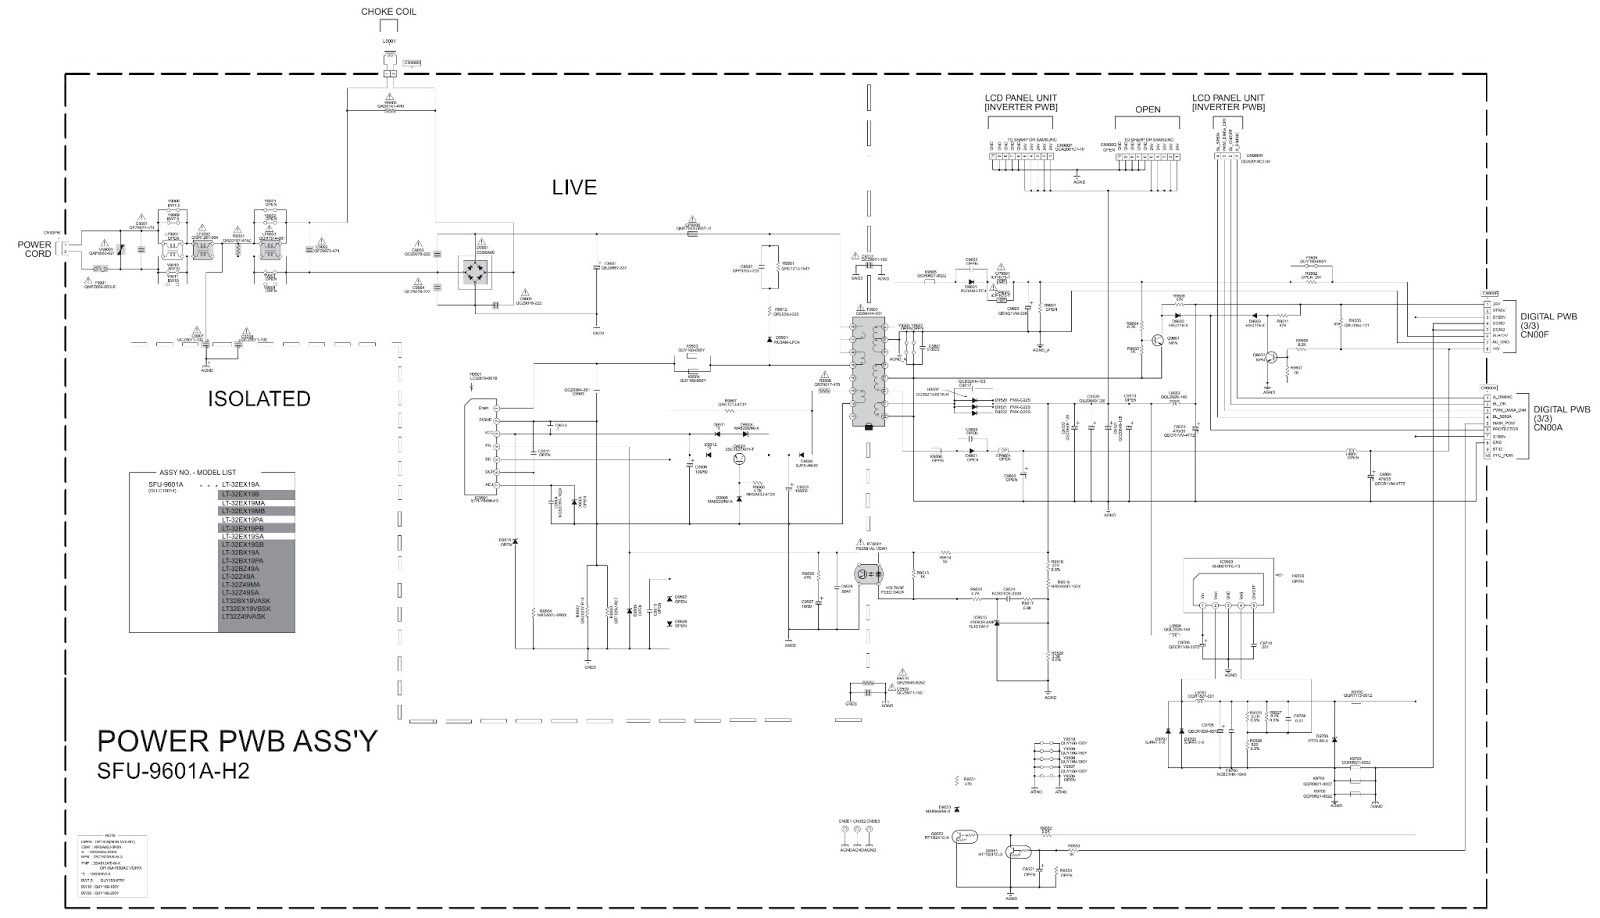 lt 32ex29 lt 32ex19 jvc lcd tv main power supply schematic circuit diagram jvc tv [ 1600 x 918 Pixel ]